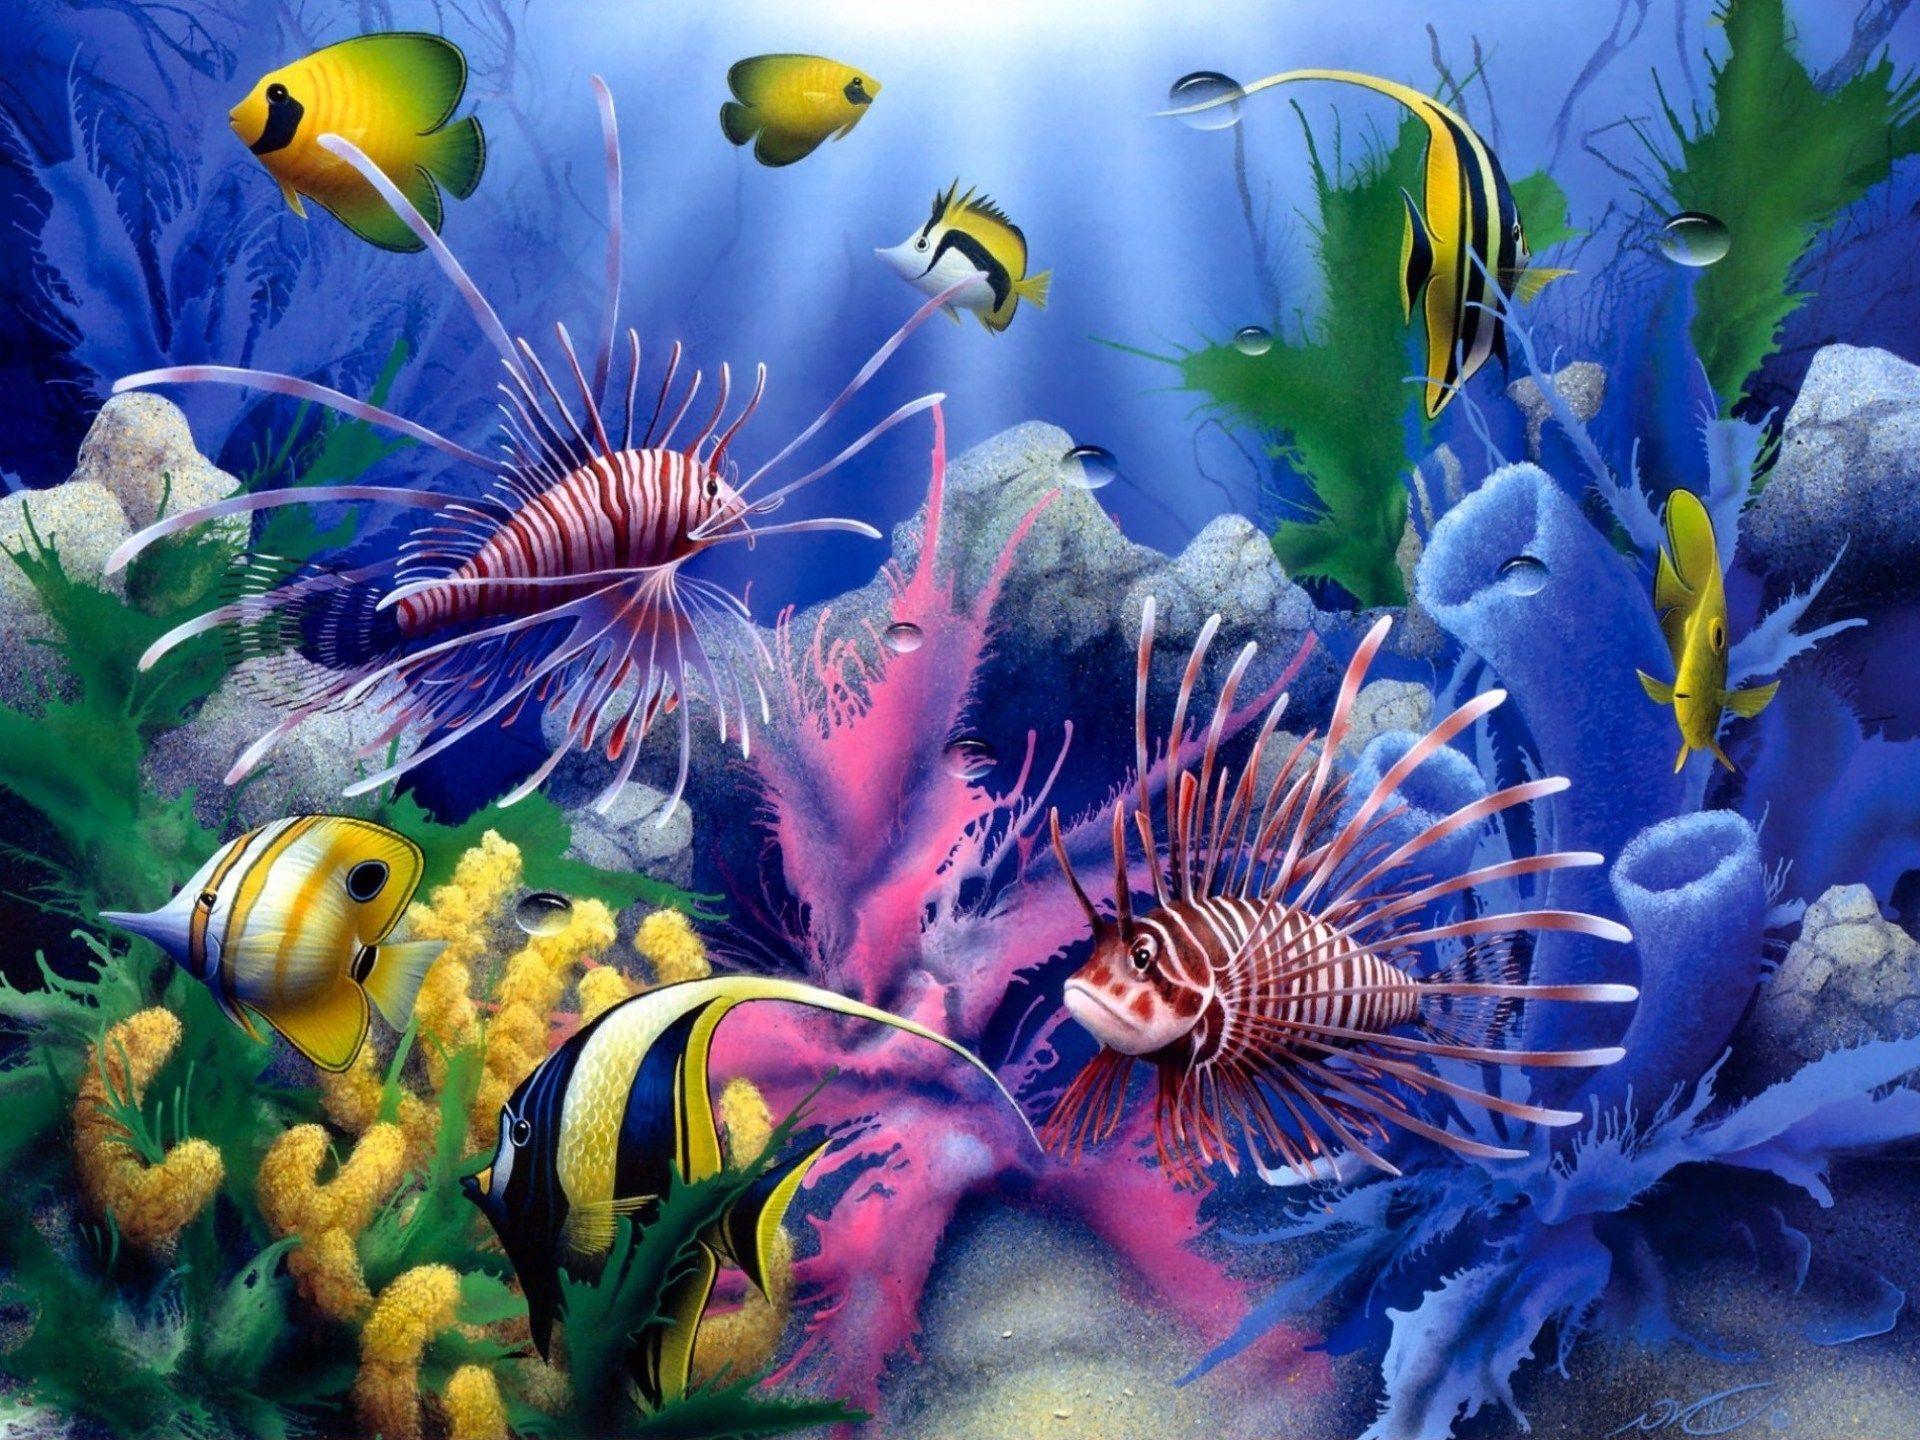 Coral Reef Paint Color What Color Is Coral Reef Color Underwater Coral Reef Ocean